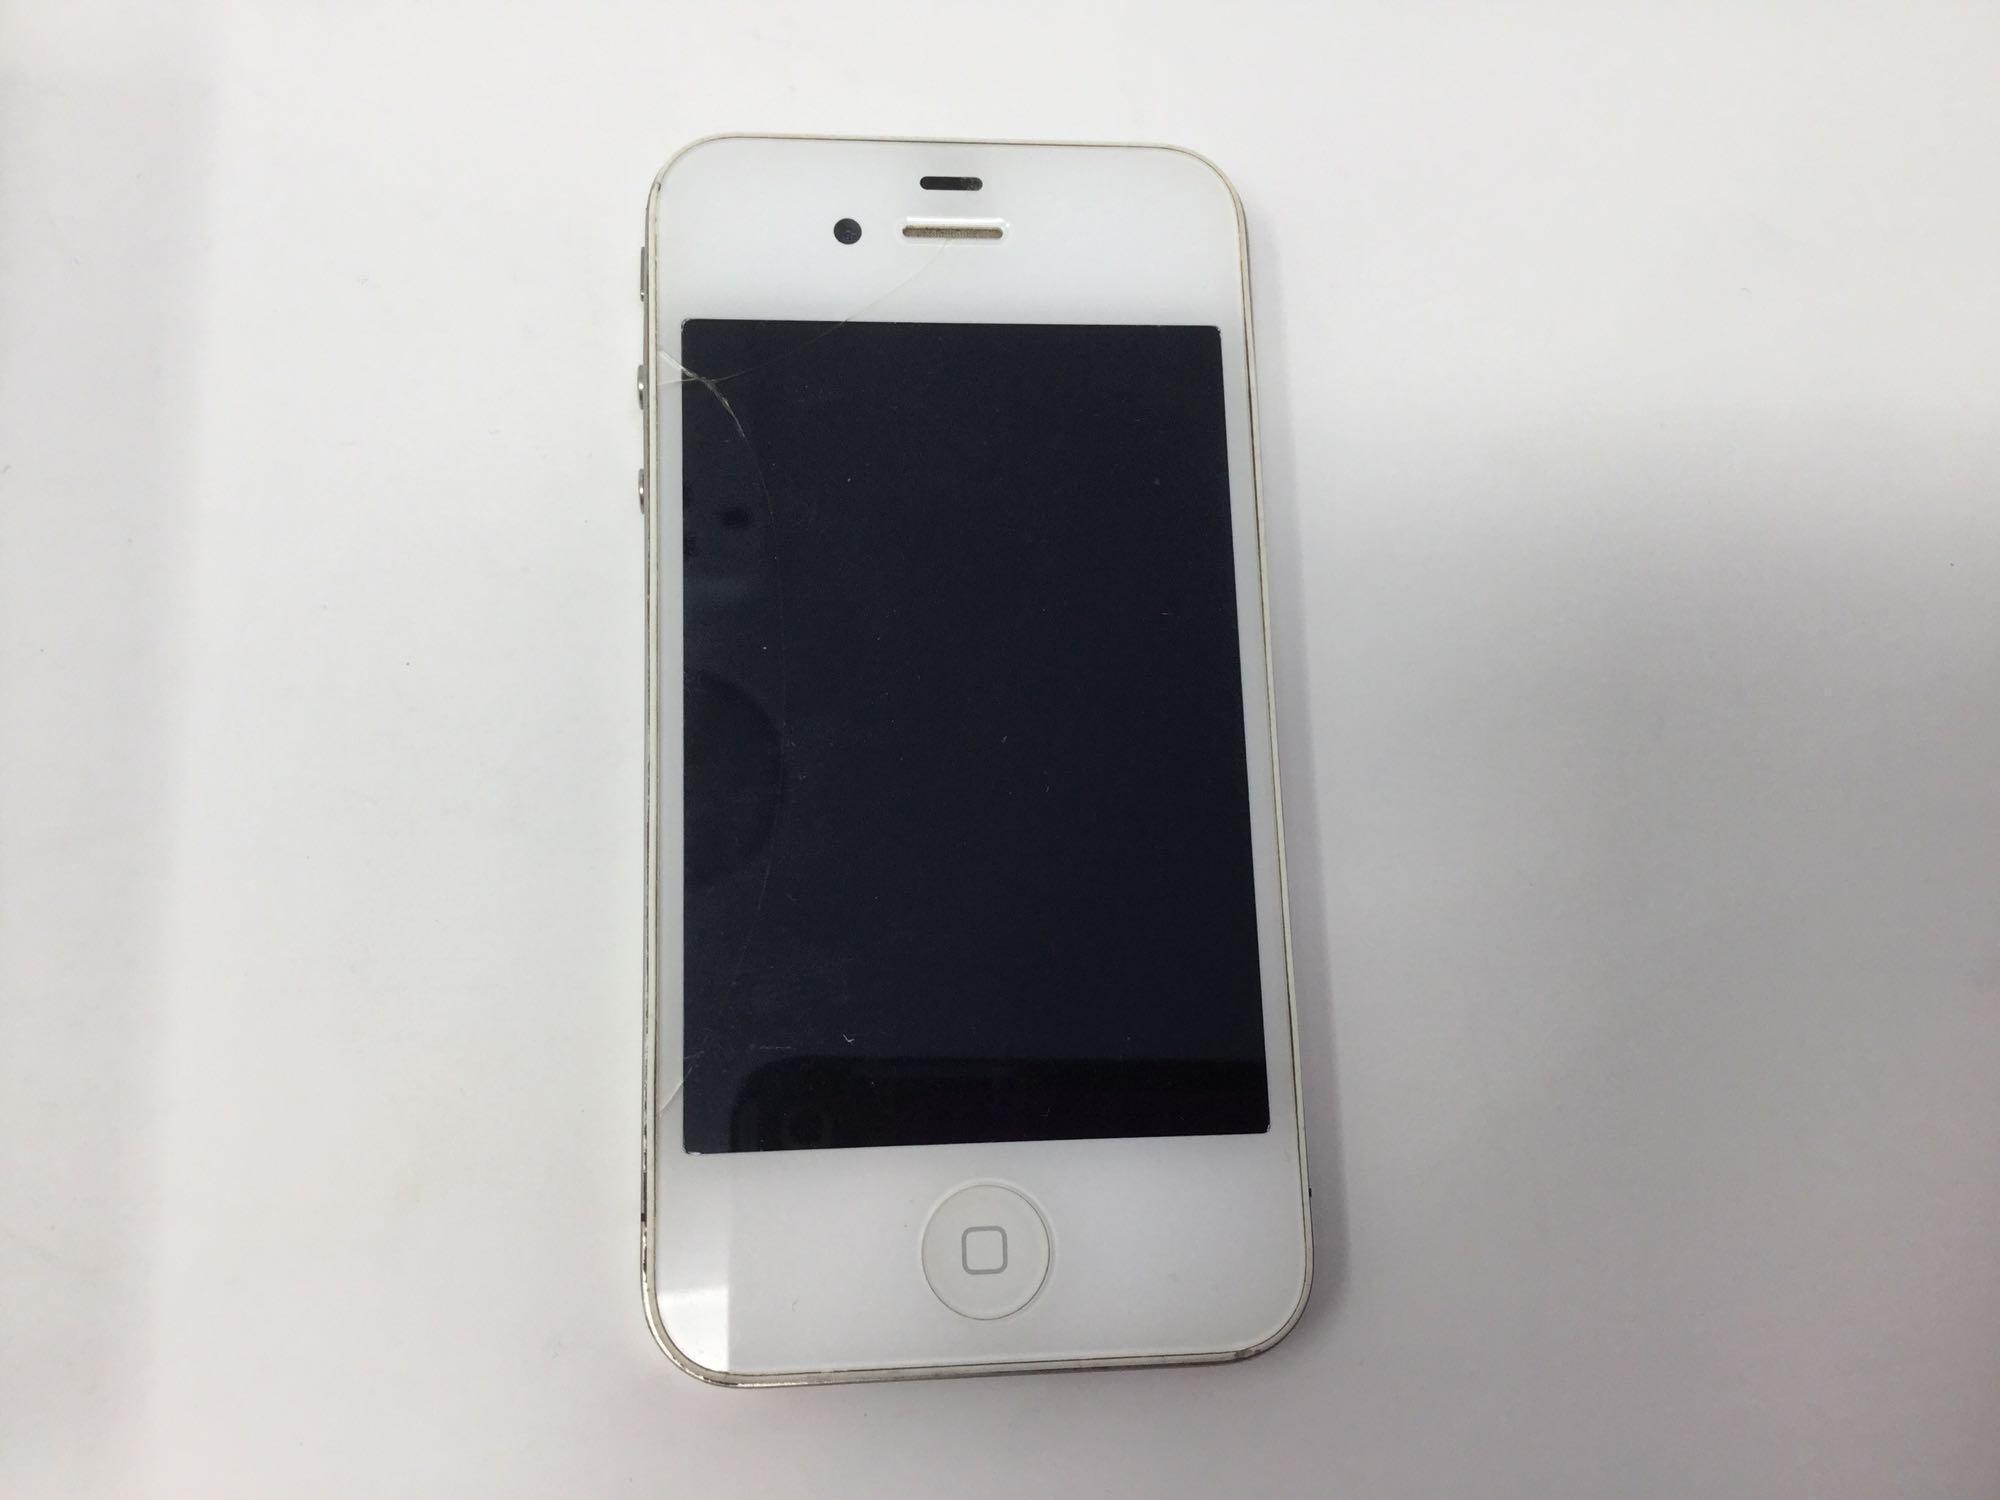 Lot 2 - iPhone 4S White 8GB